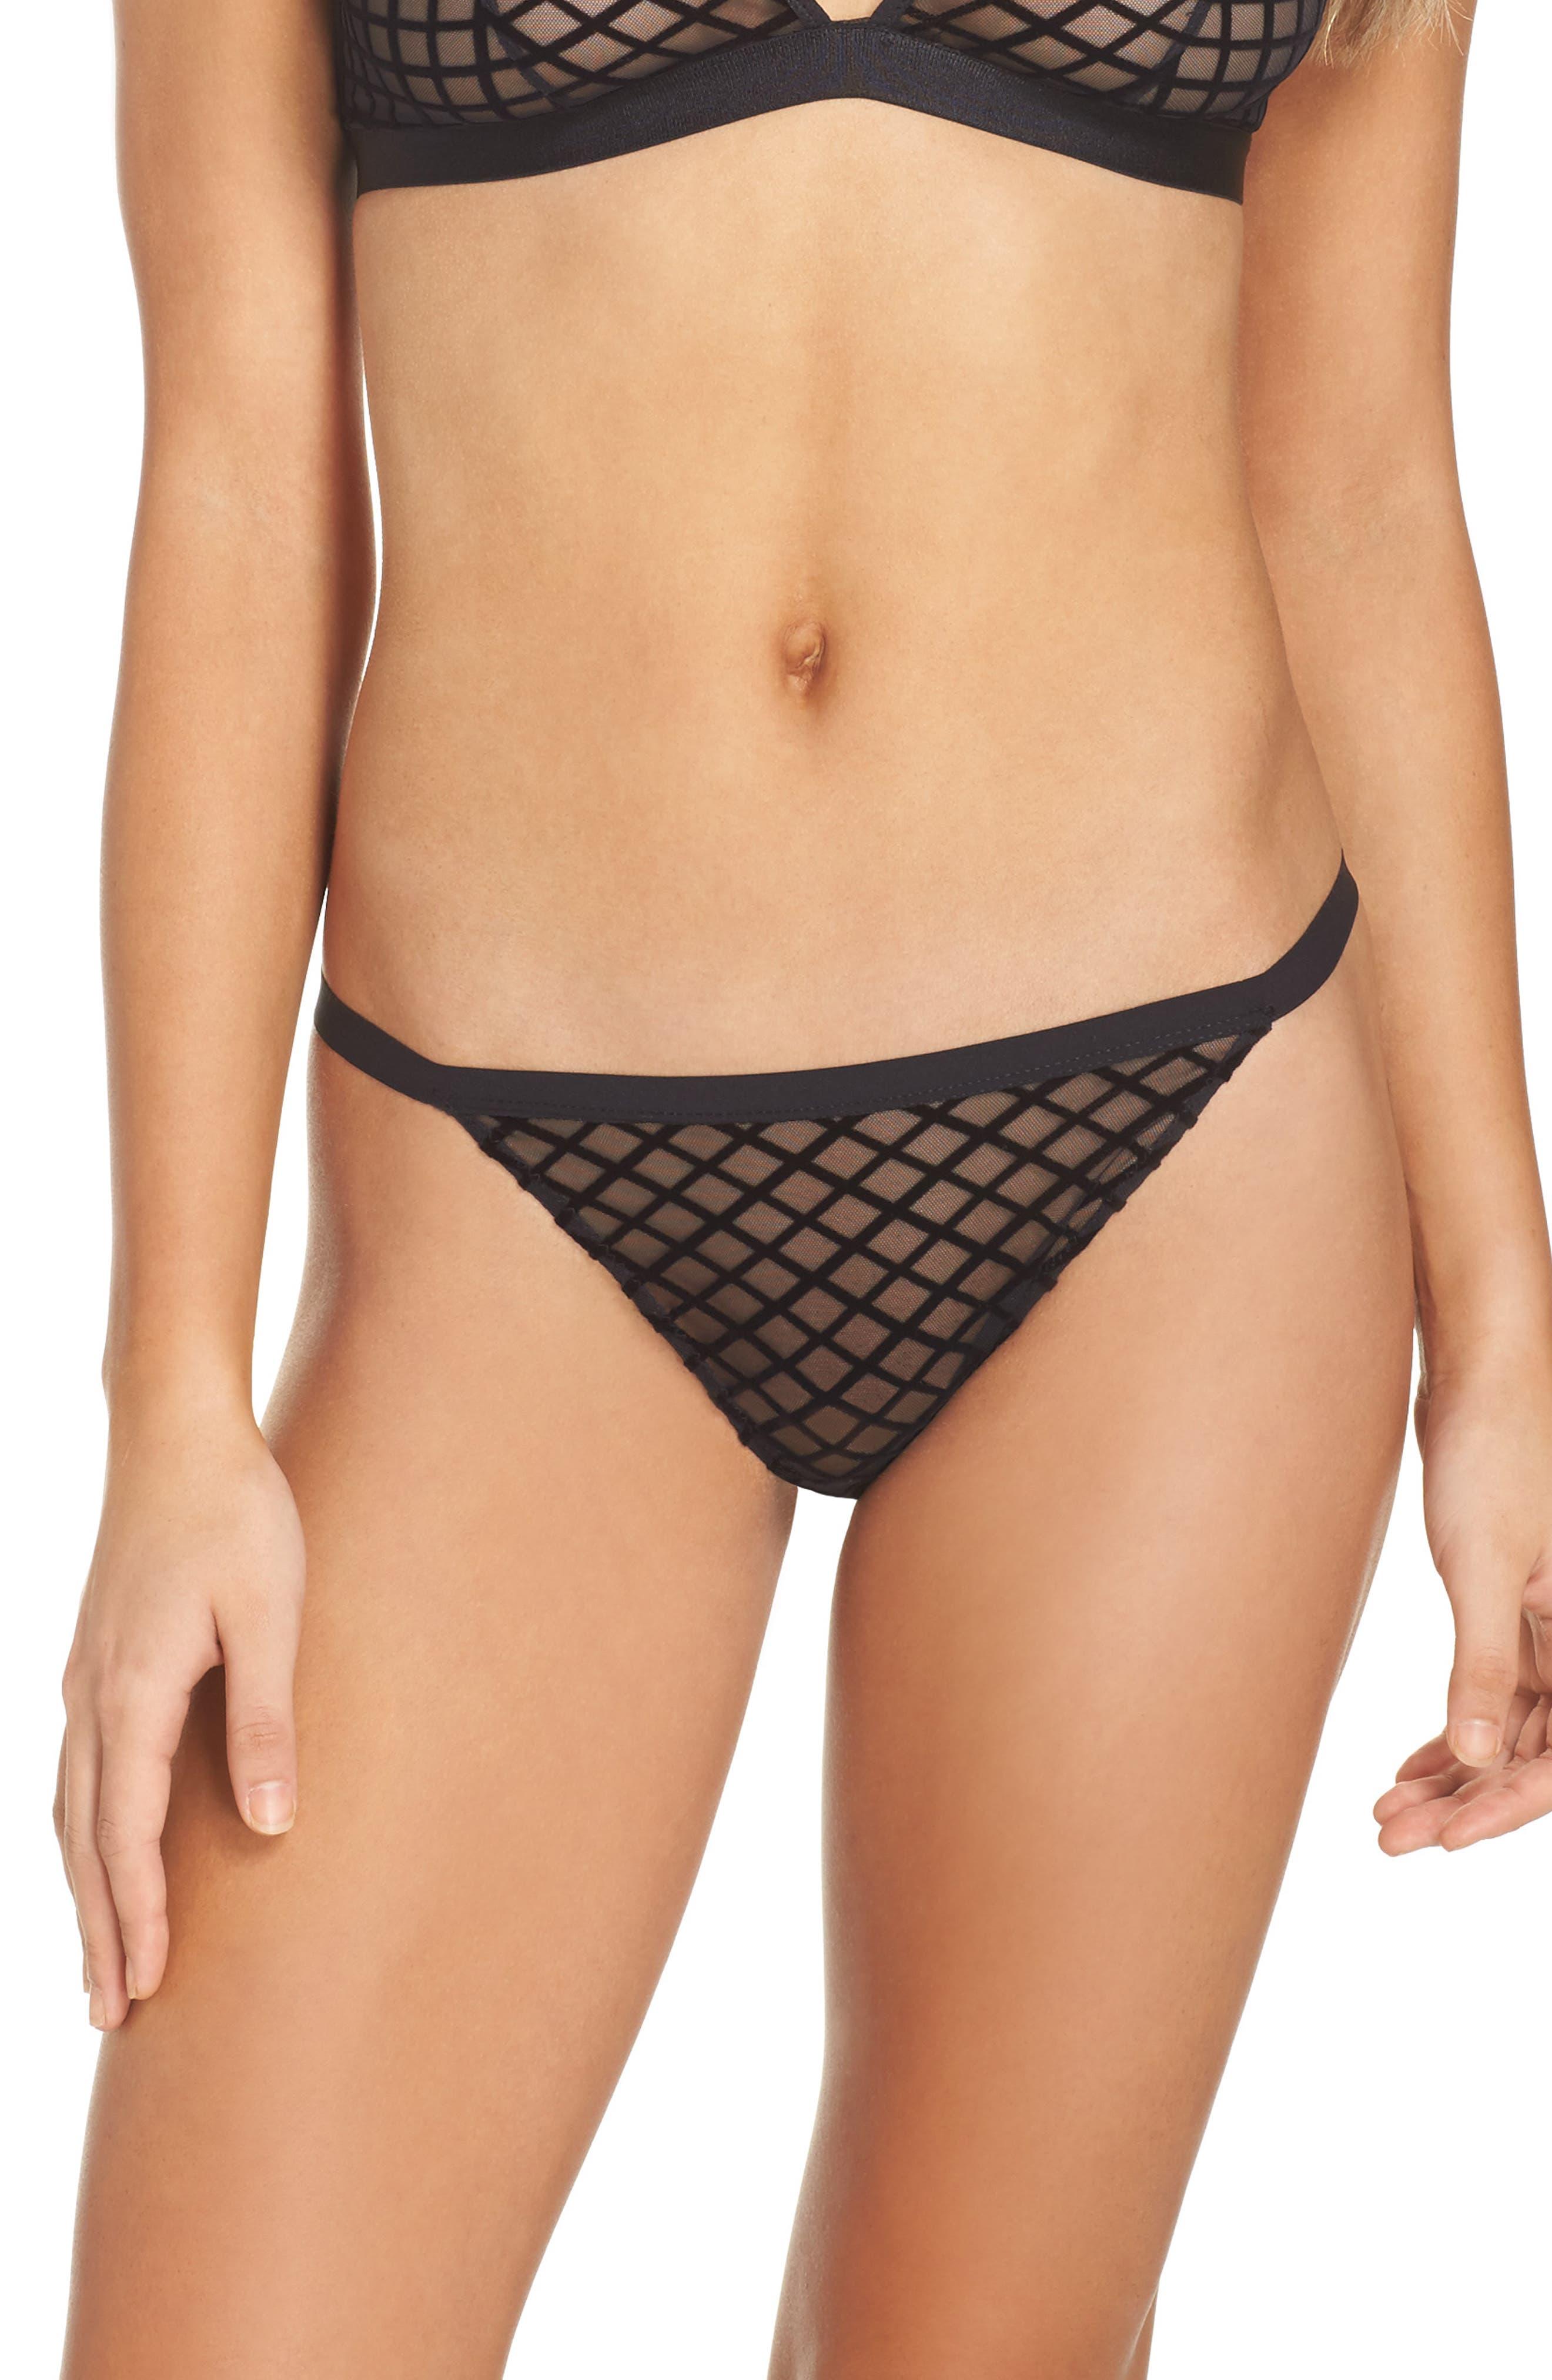 Bisou Tex String Bikini,                             Main thumbnail 1, color,                             001